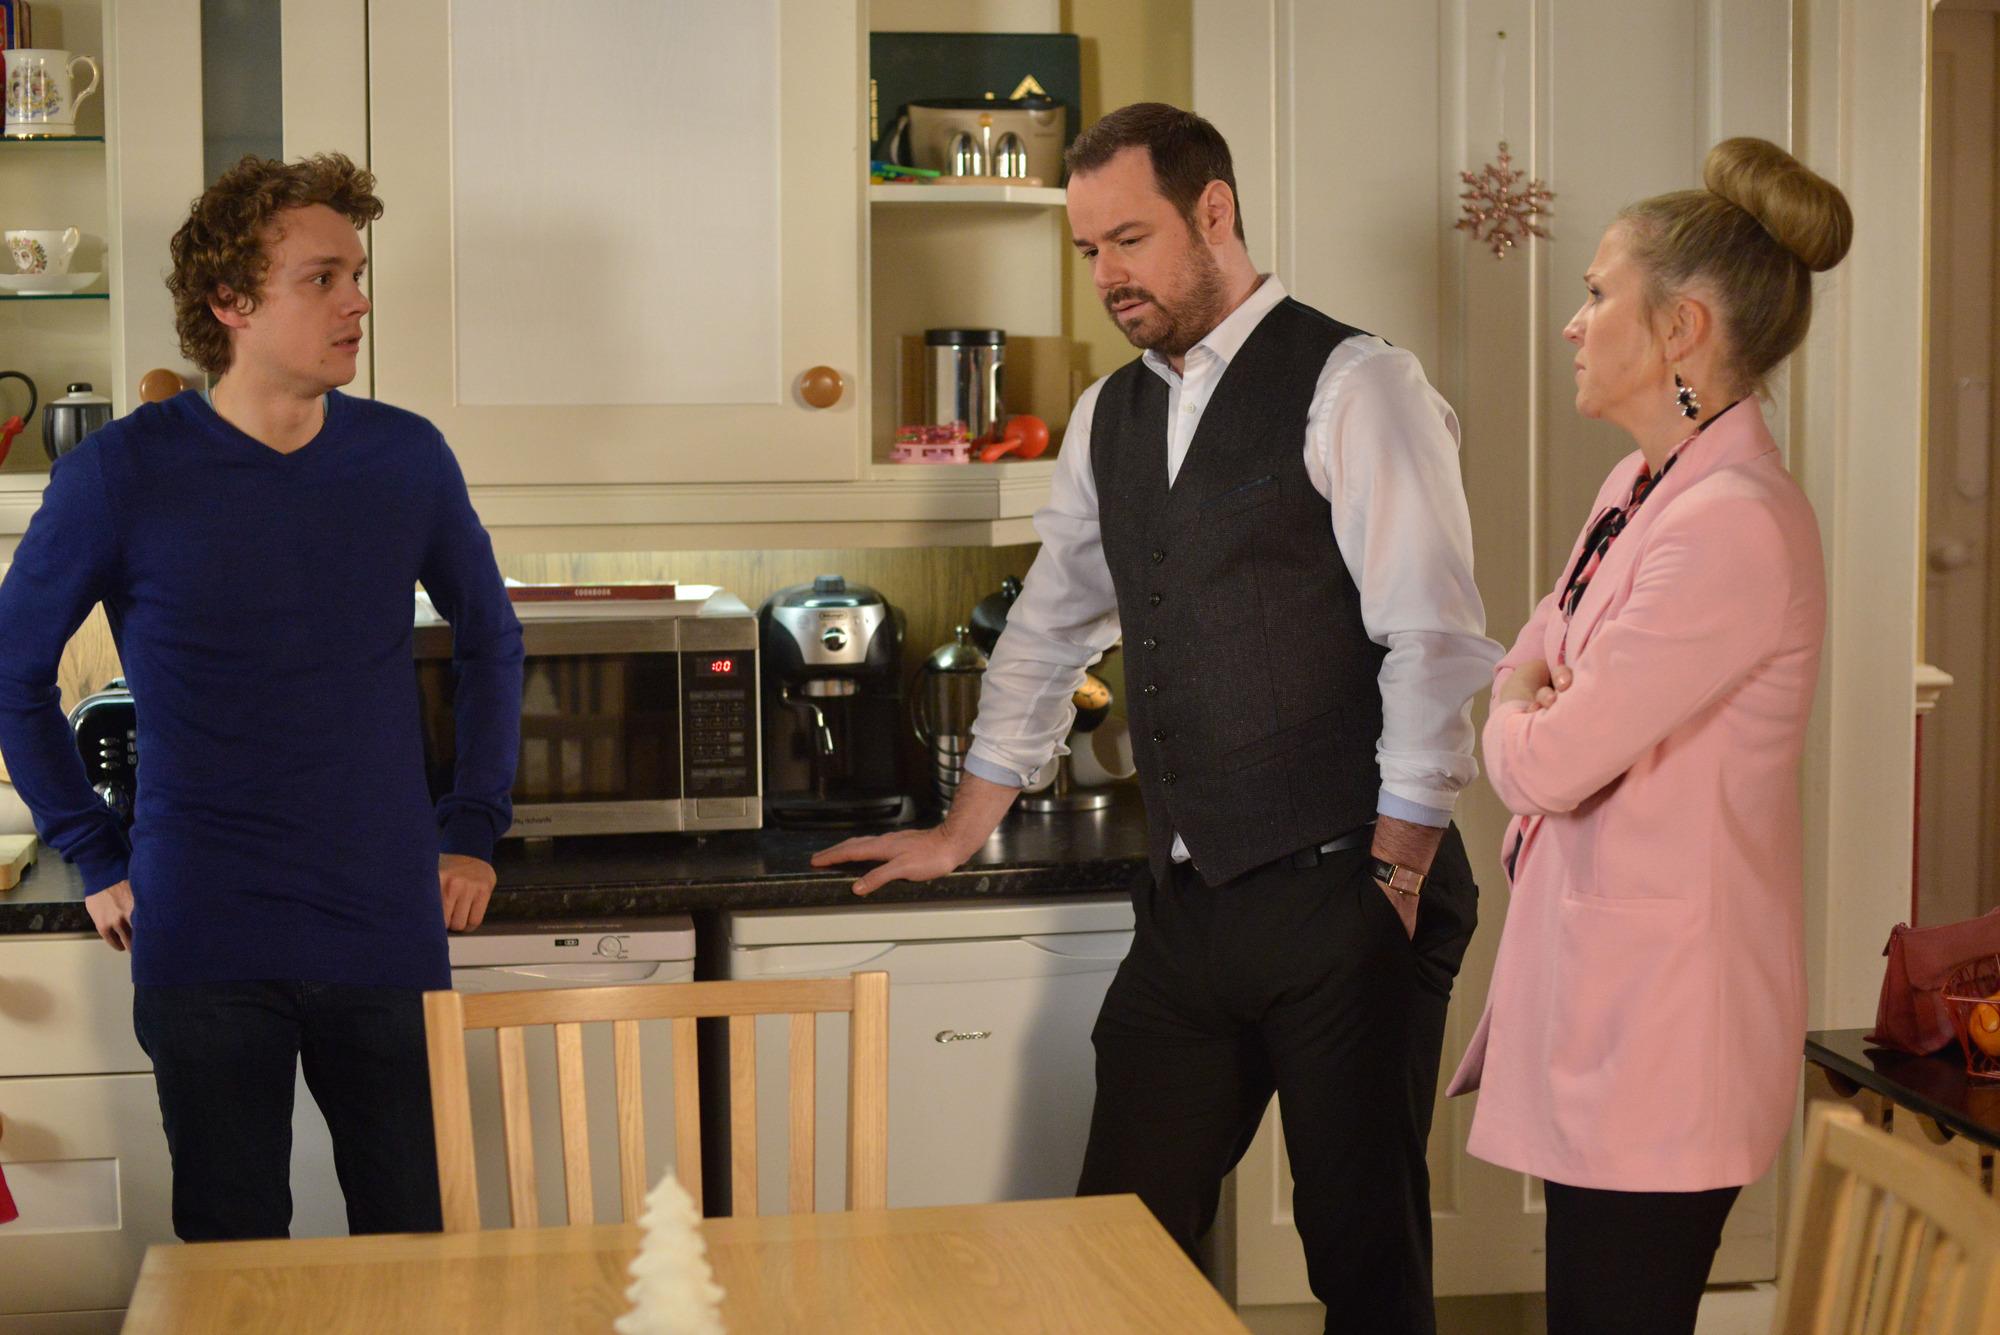 EastEnders spoilers: Mick and Linda Carter decide to leave Walford